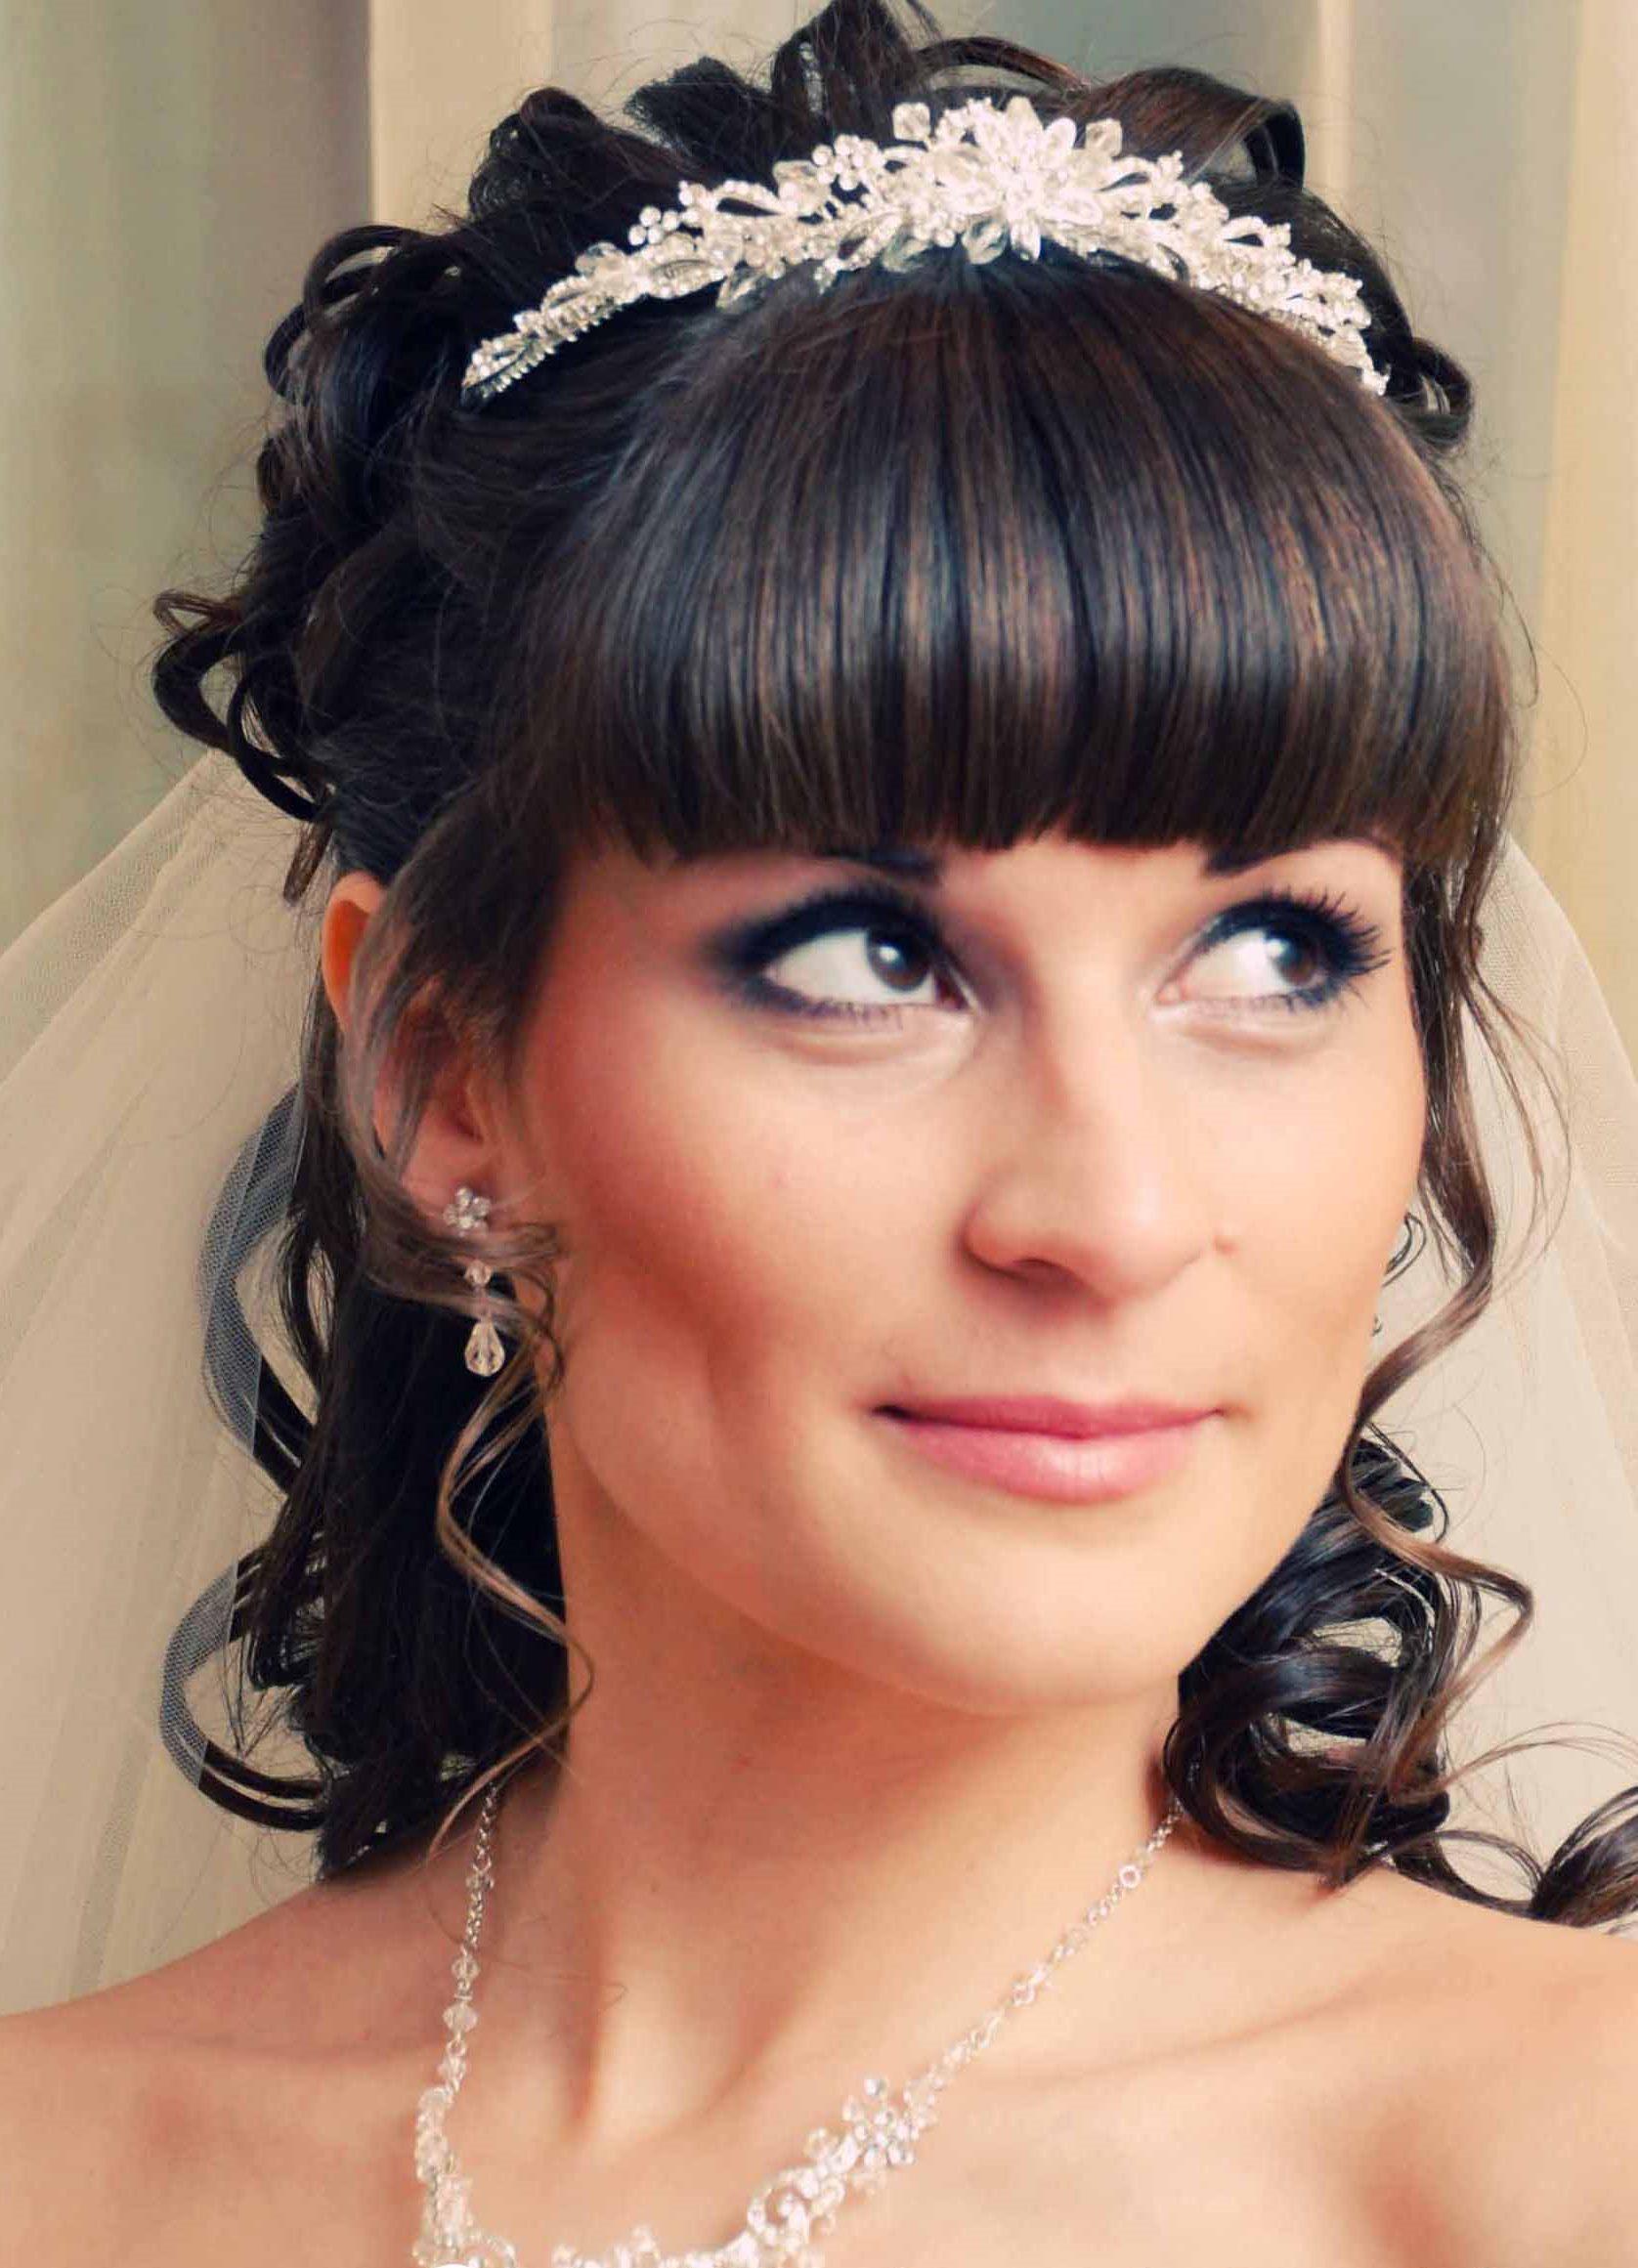 Прически на свадьбу с челкой картинки